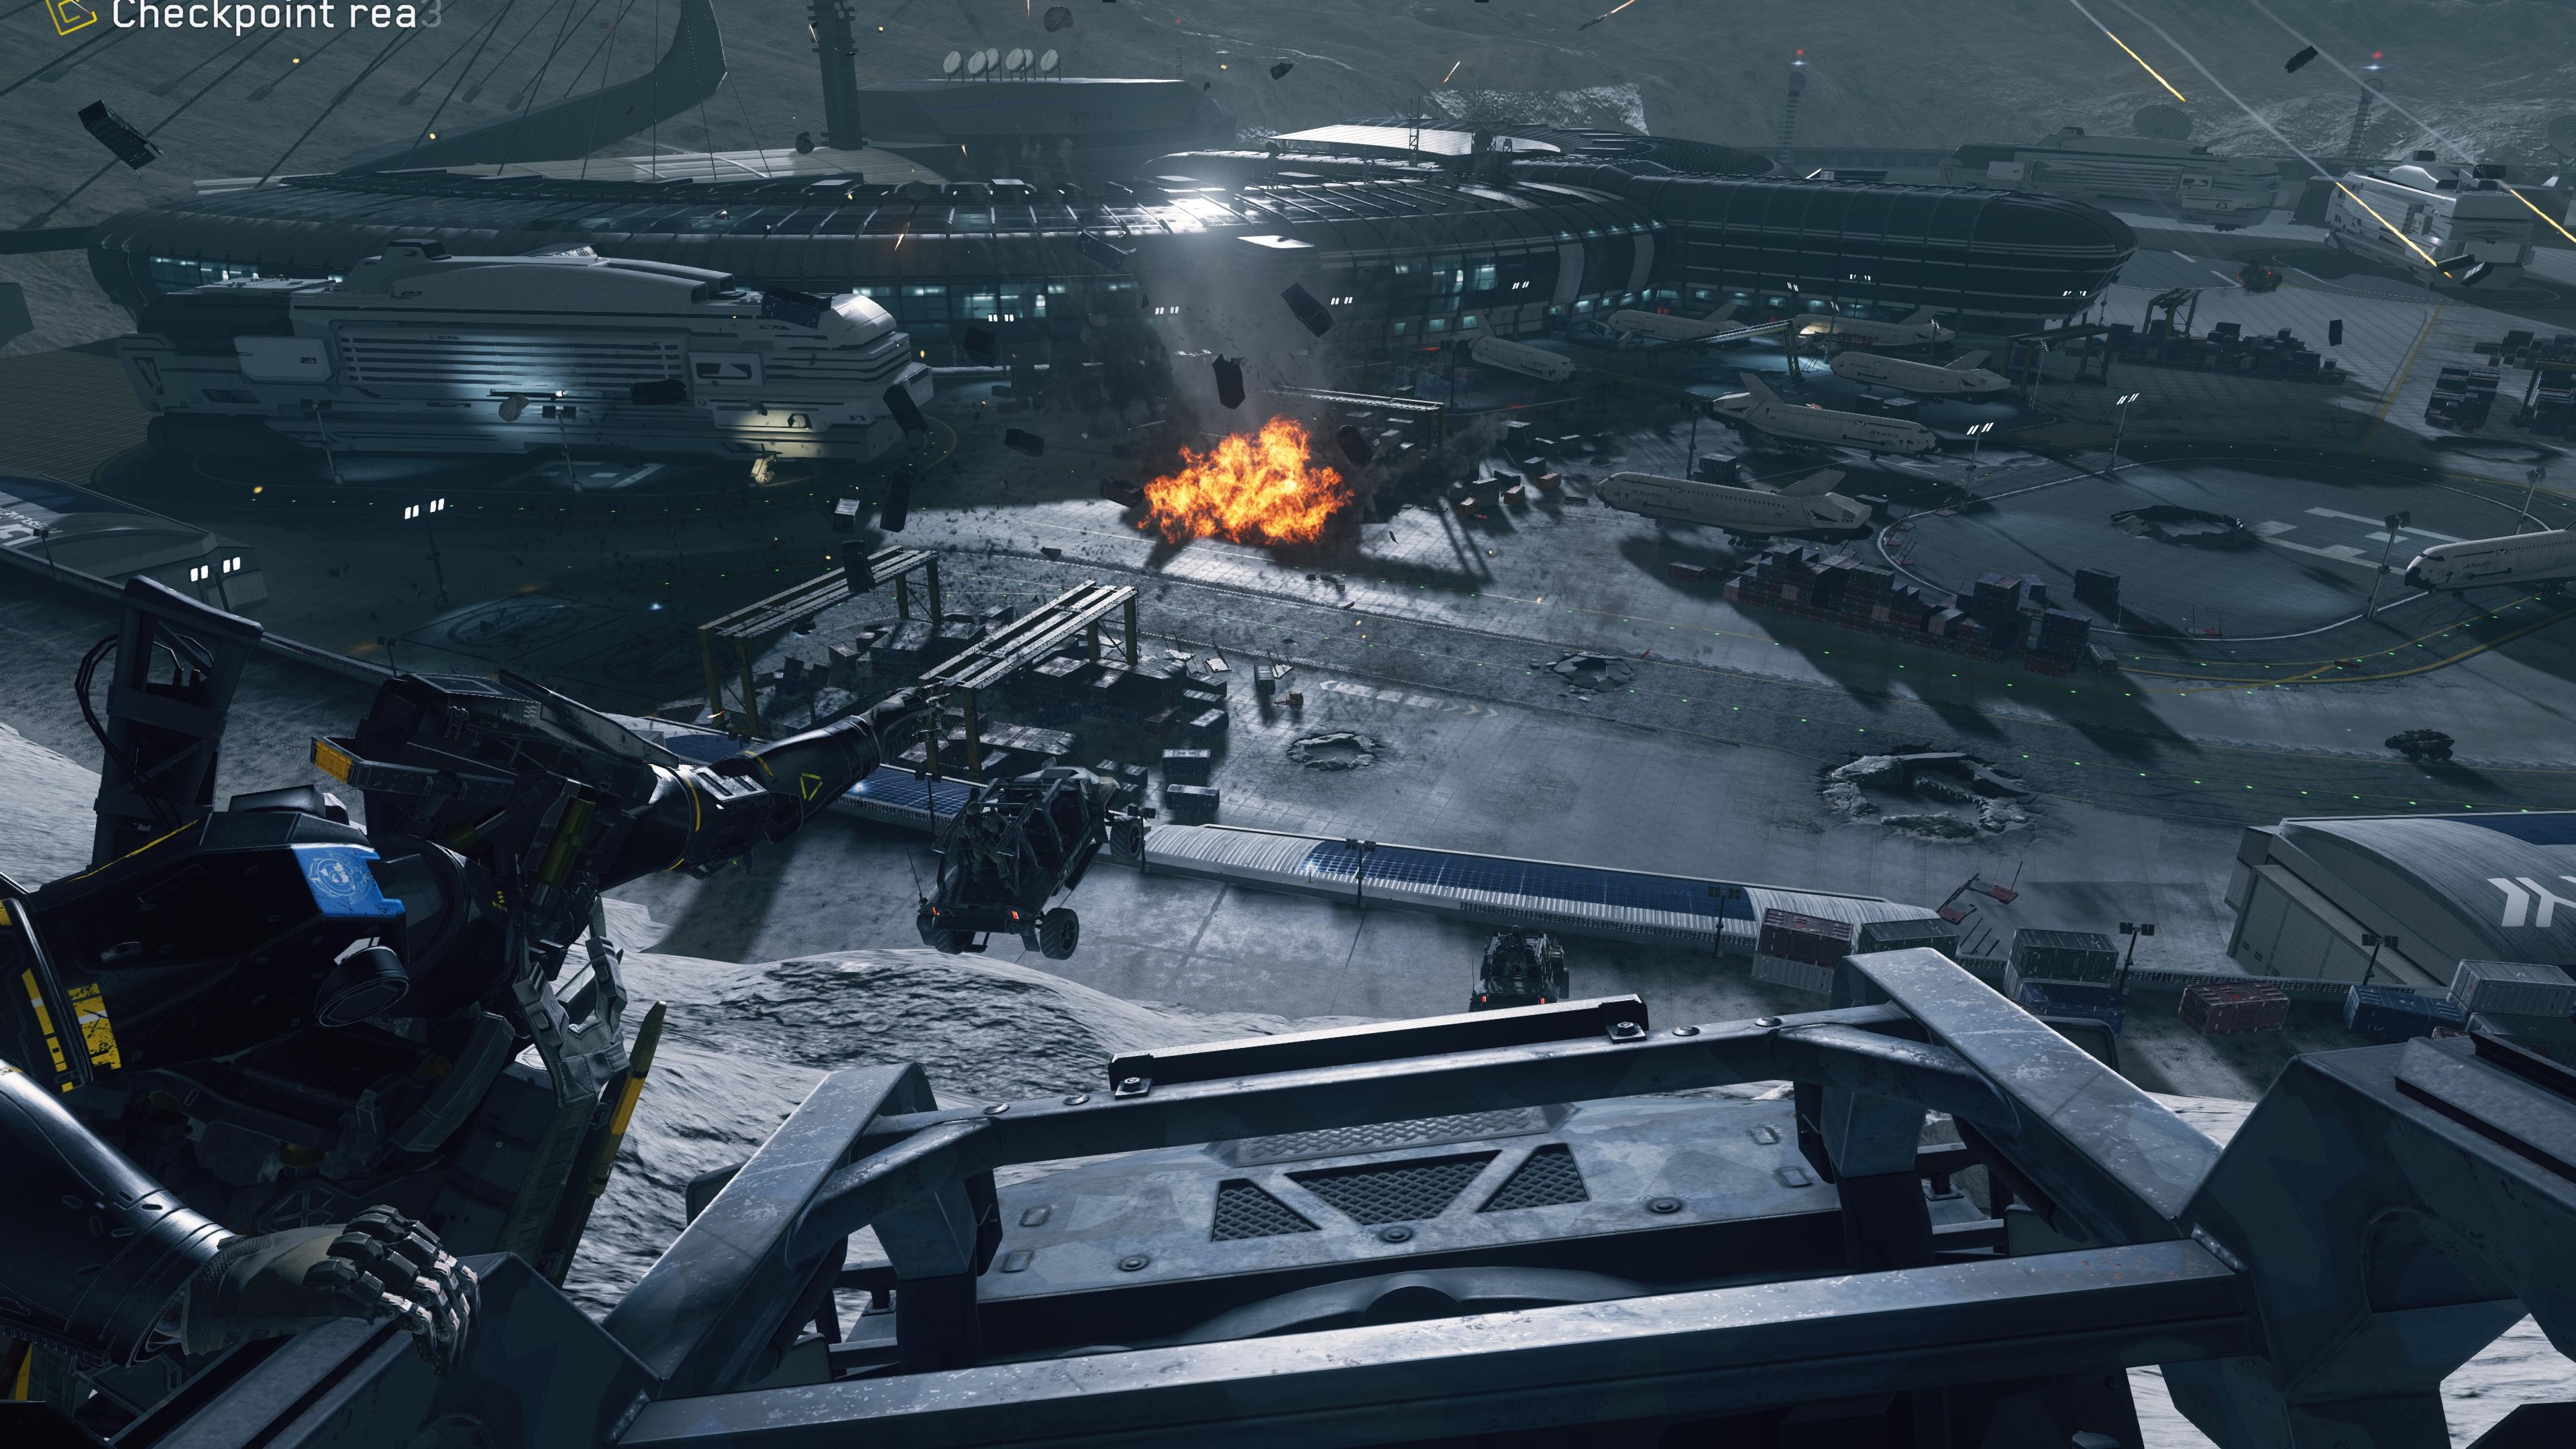 46 Call Of Duty Infinite Warfare Hd Wallpapers Background